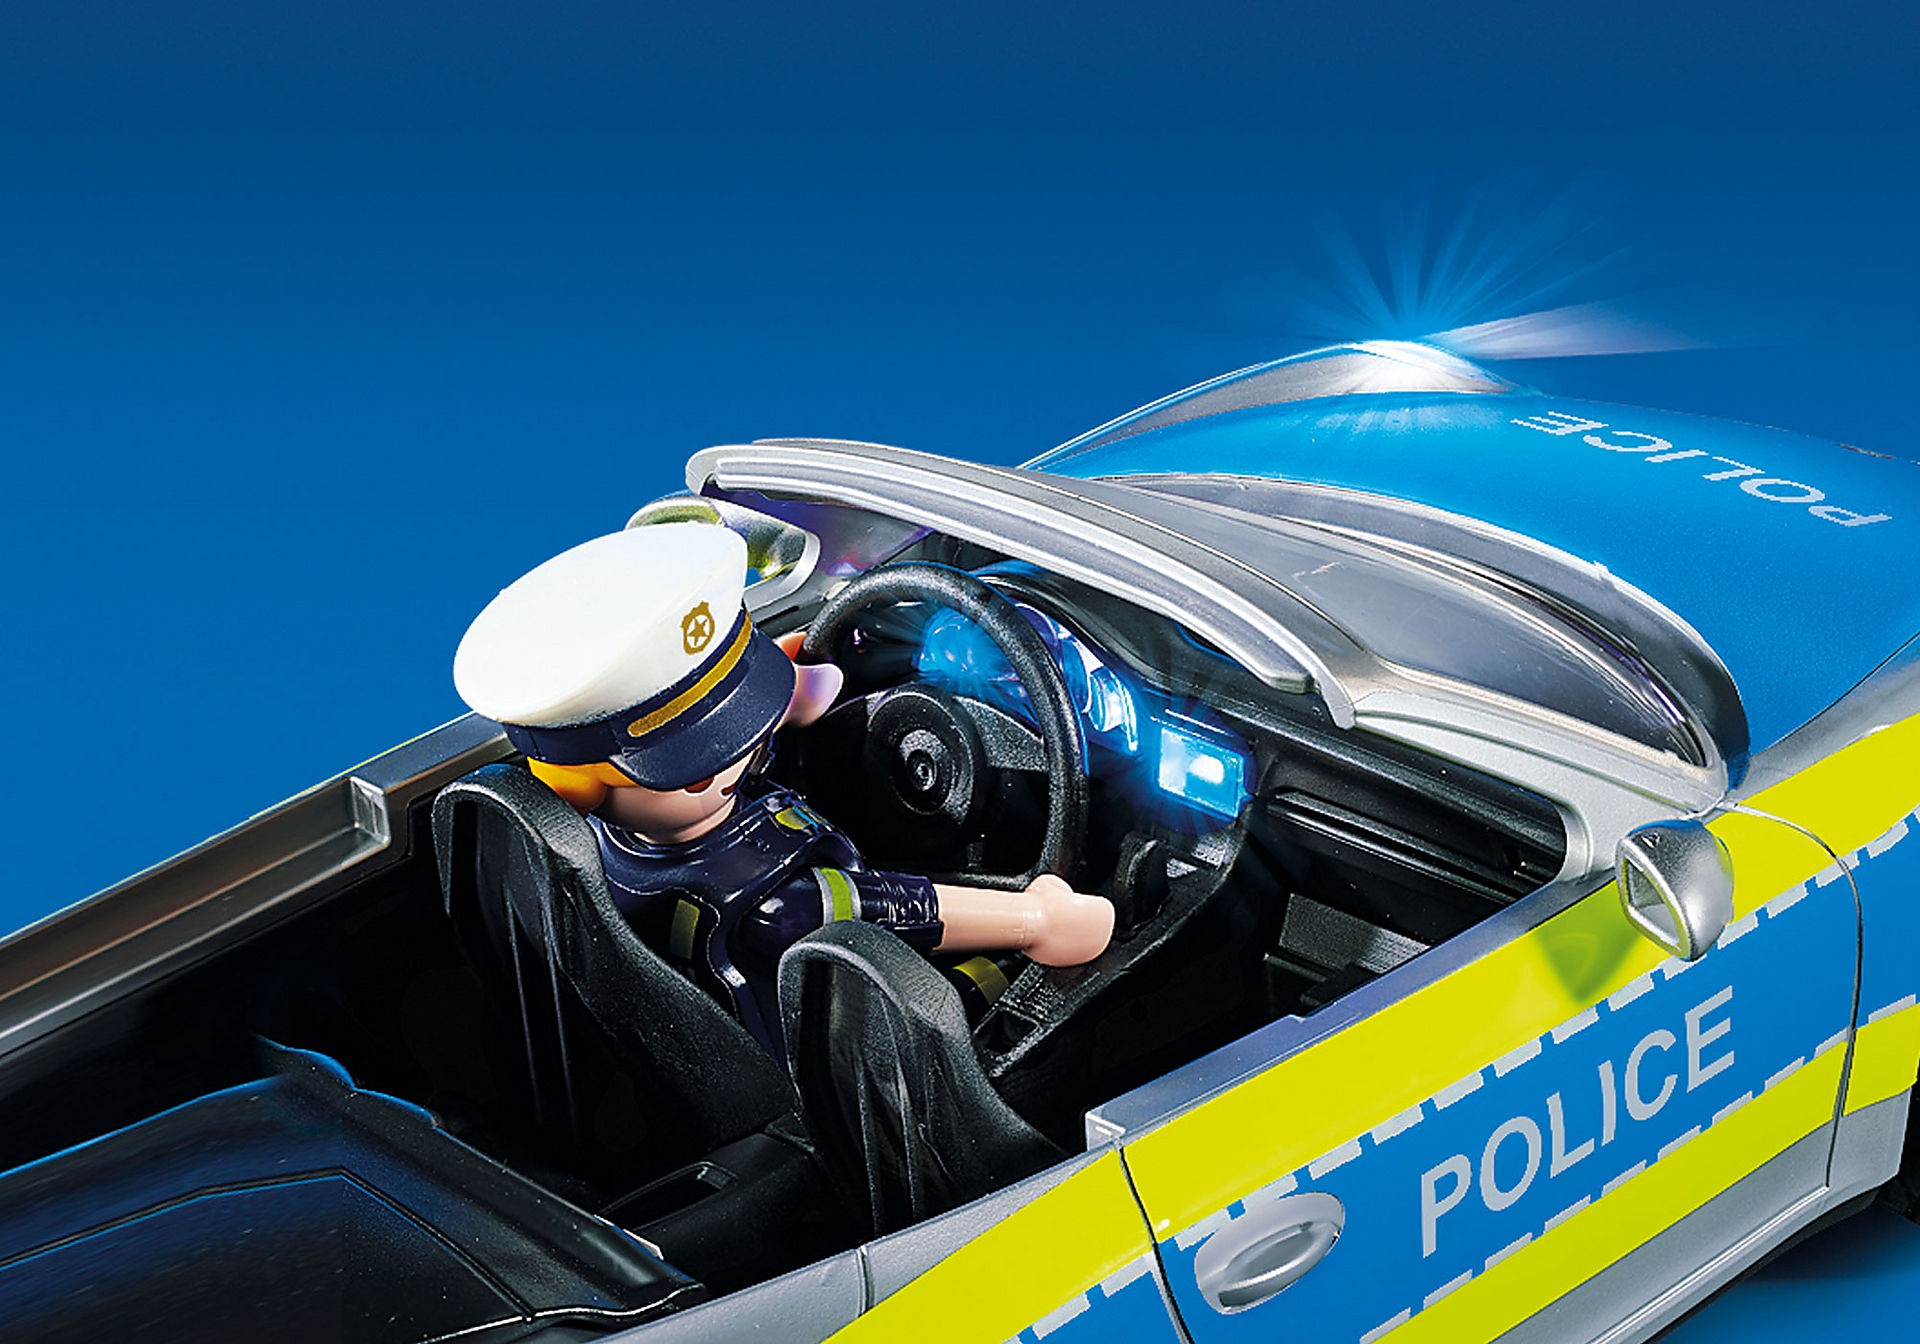 70066 Porsche 911 Carrera 4S Policja zoom image7